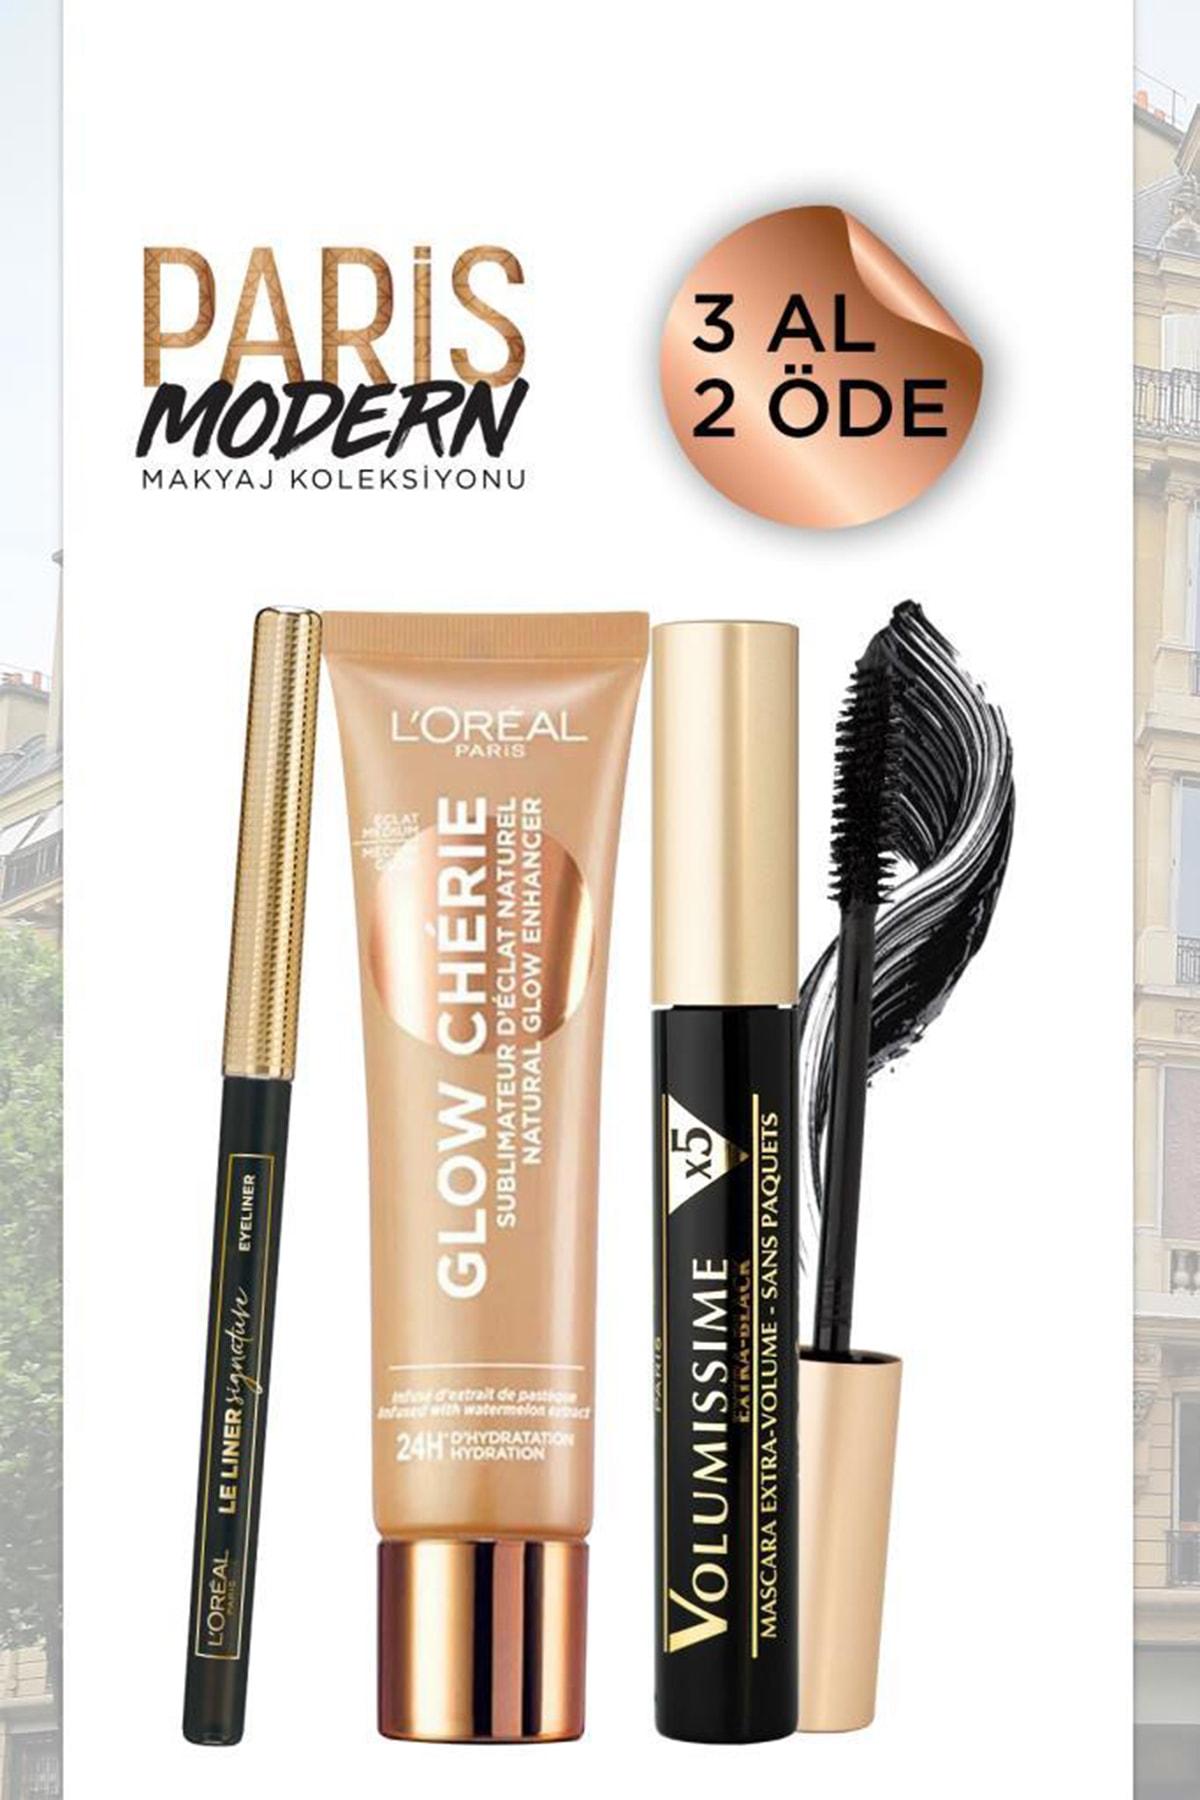 L'Oreal Paris Voluminous Carbon Black Mascara&Glow Cherie Highlight 02&Le Liner Signature 01 36005210180951